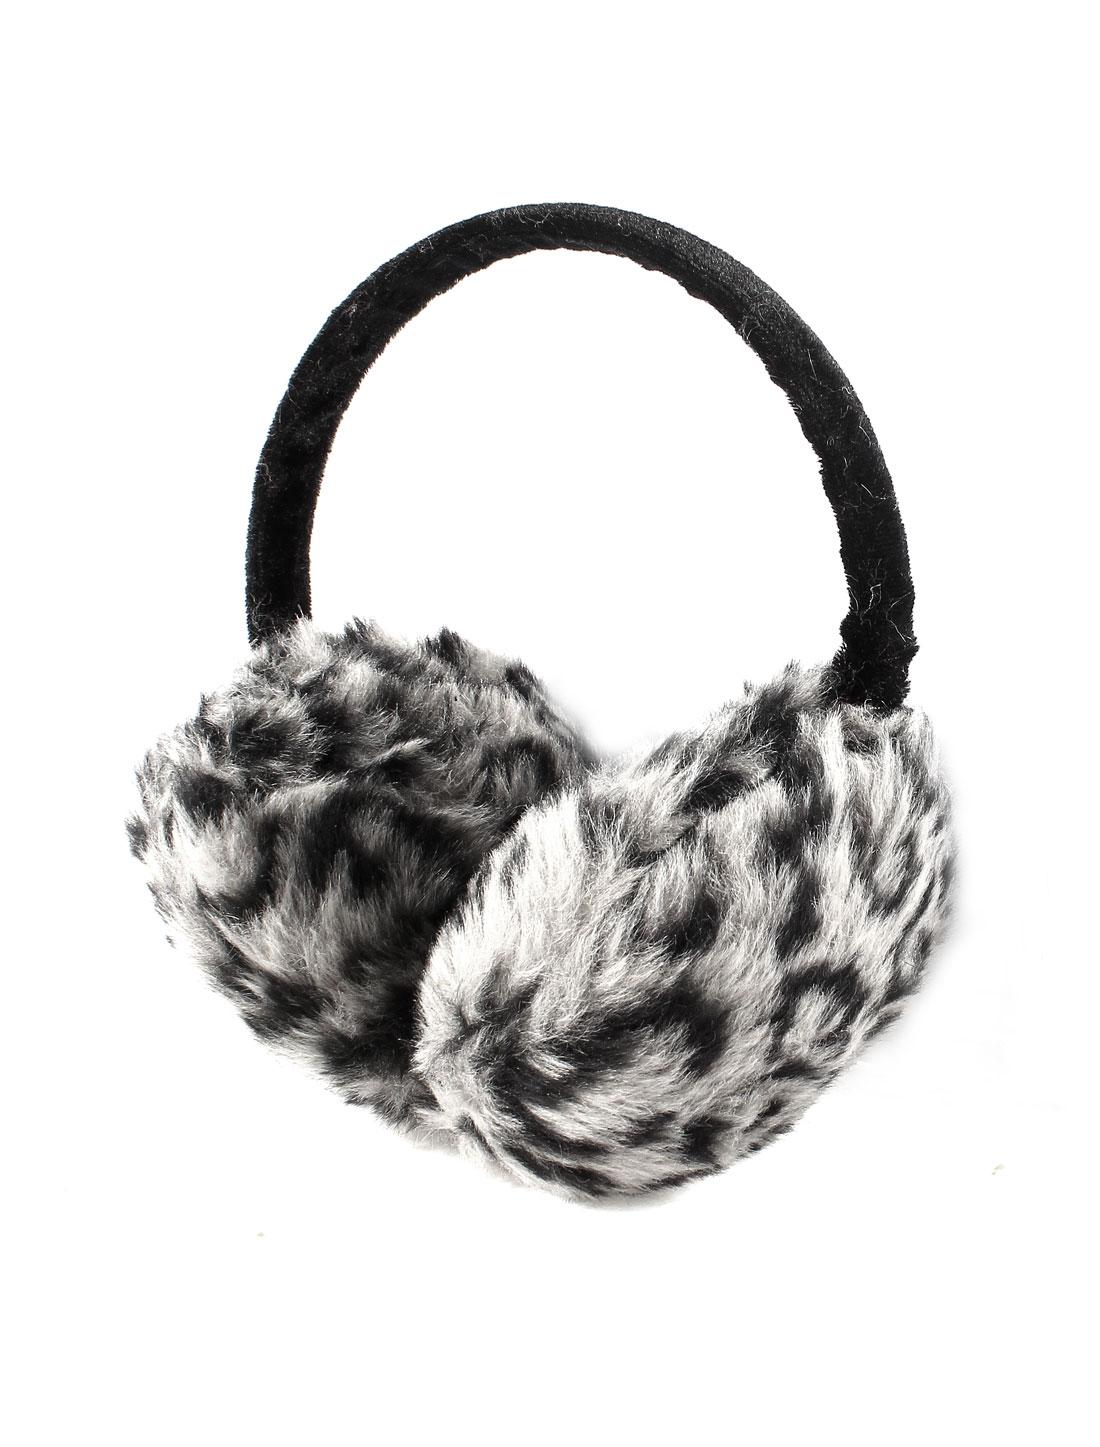 Unisex Adjustable Frame Leopard Prints Plush Black Gray Warmers Earmuffs